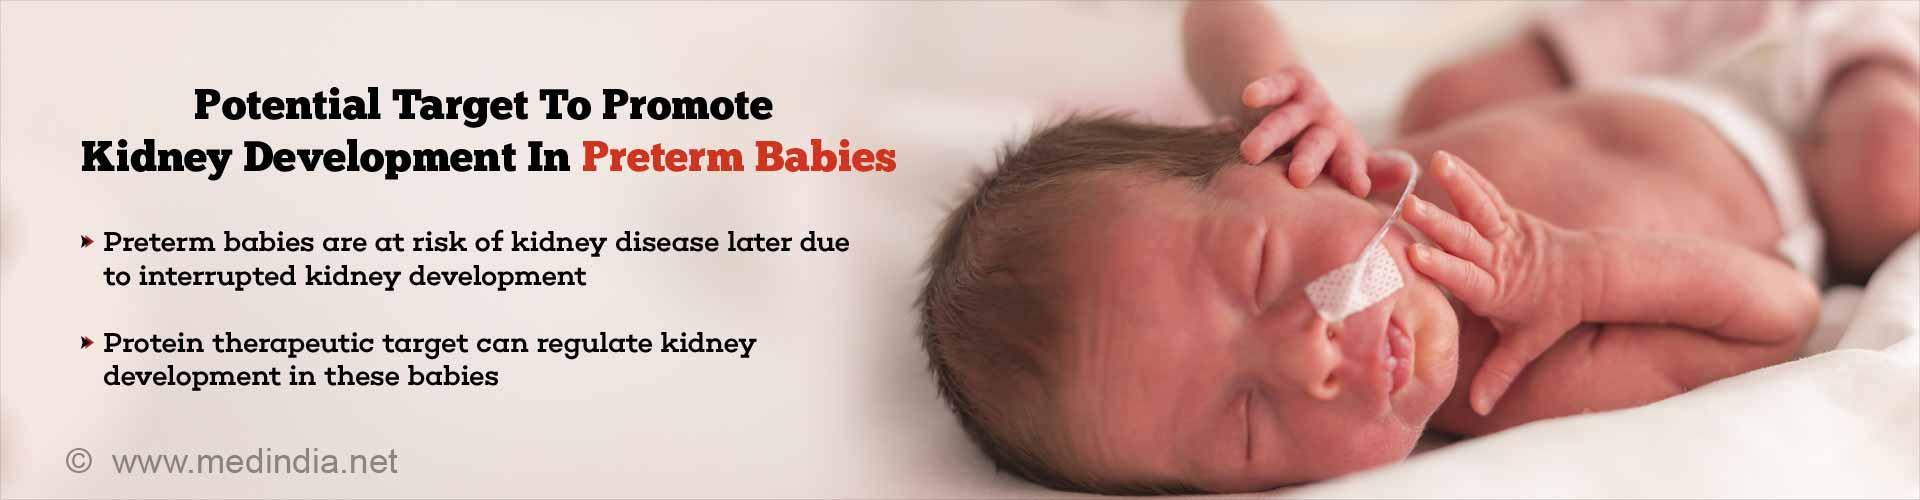 Extending Nephron Development In Preterm Babies May Prevent Kidney Disease Later